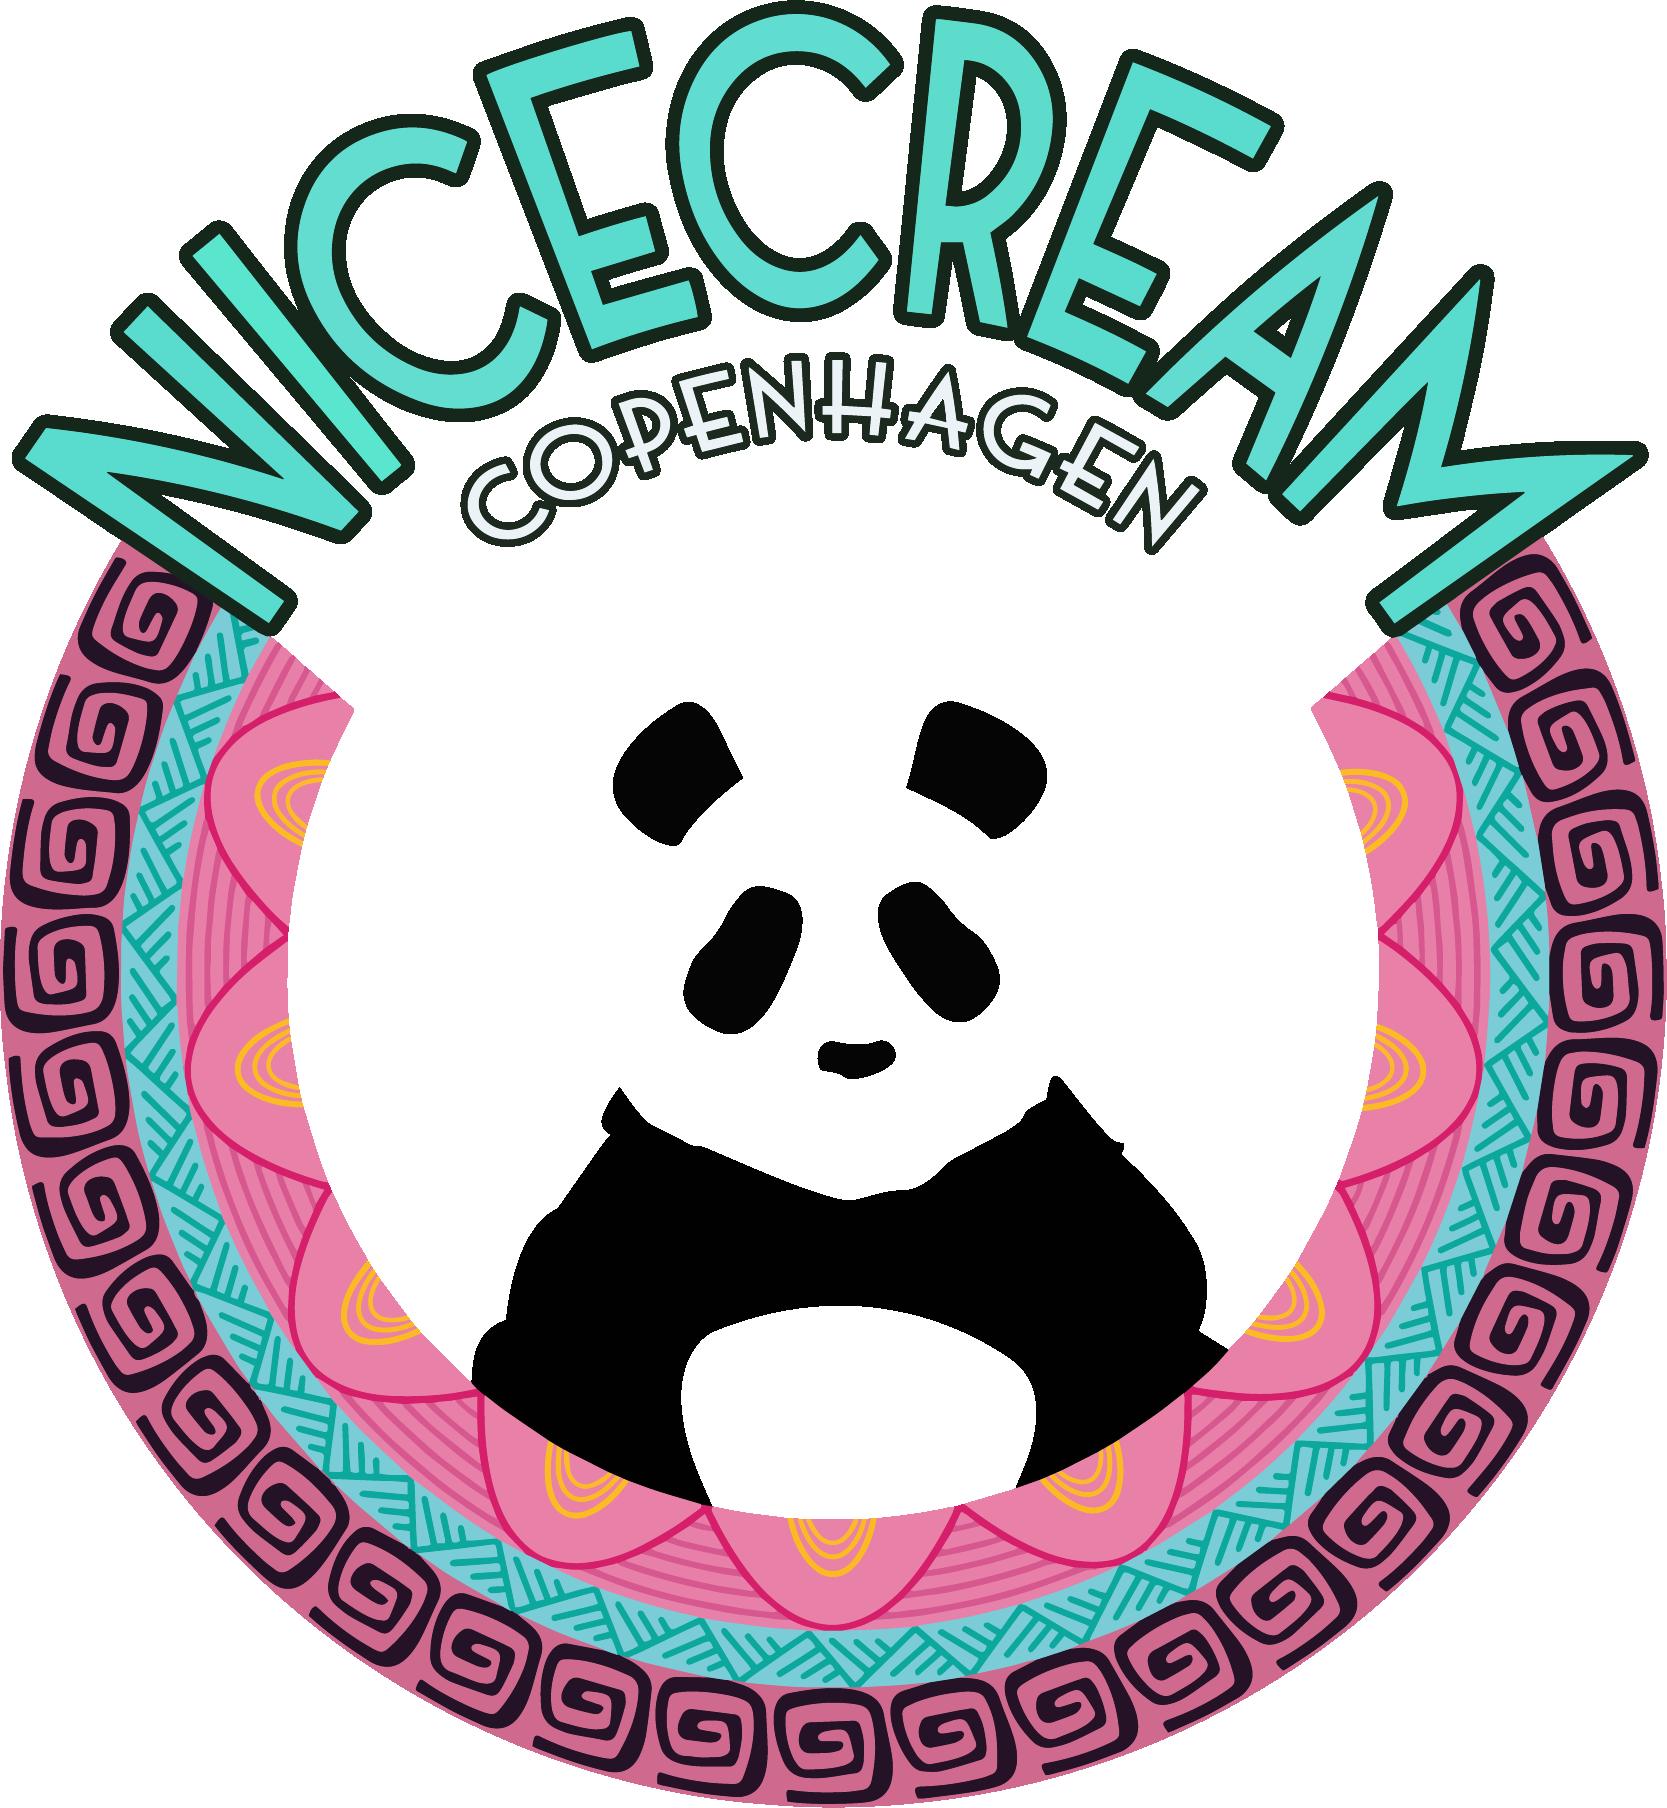 nicecream logo